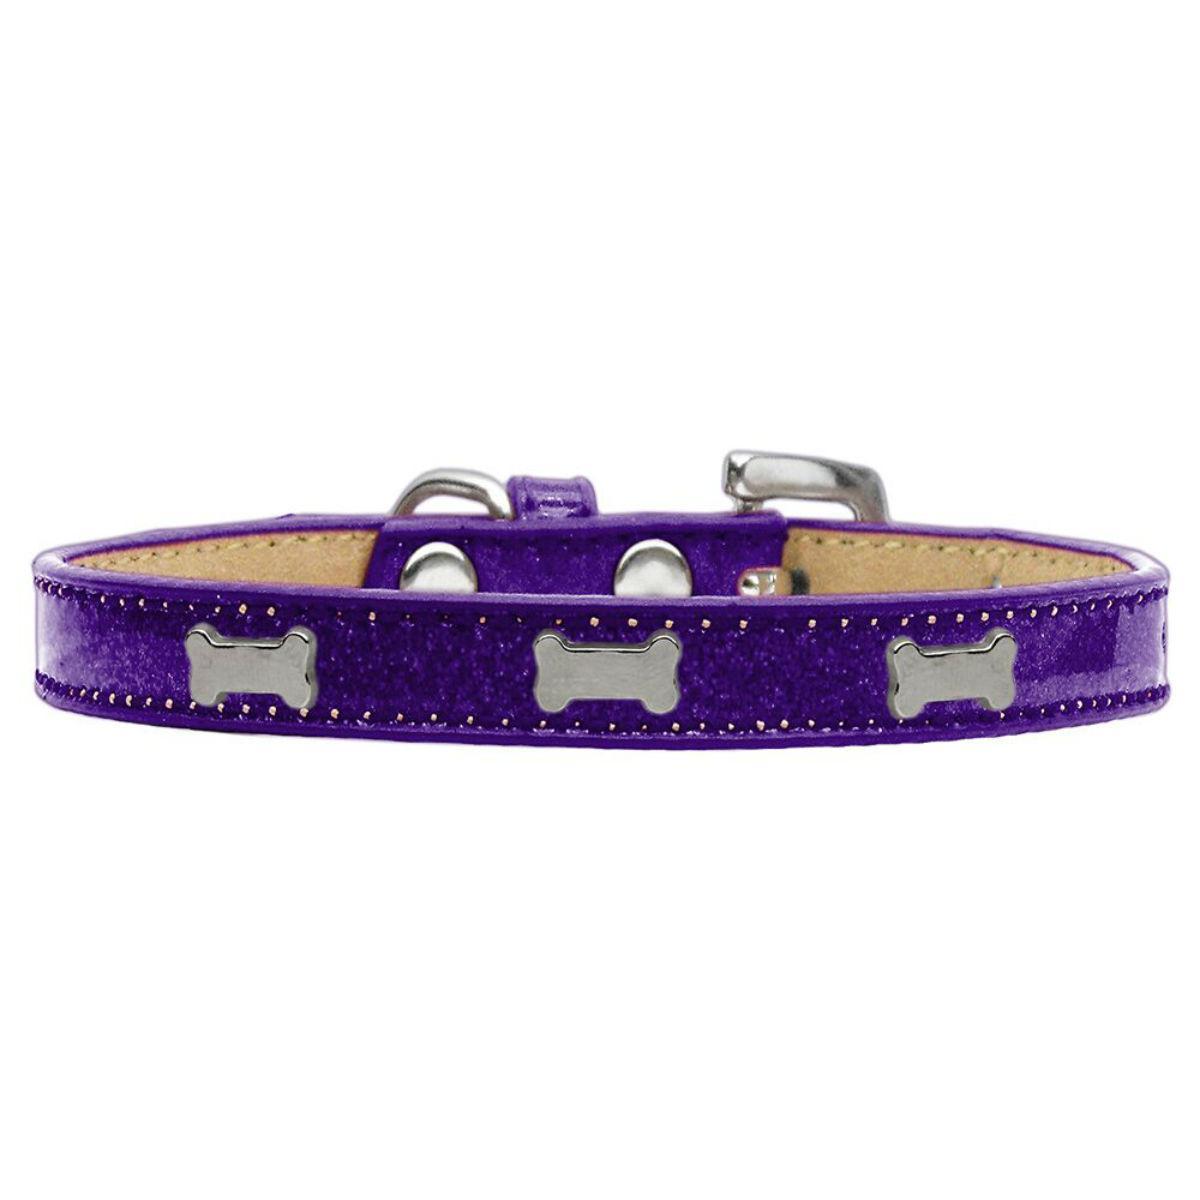 Silver Bone Widget Dog Collar - Purple Ice Cream